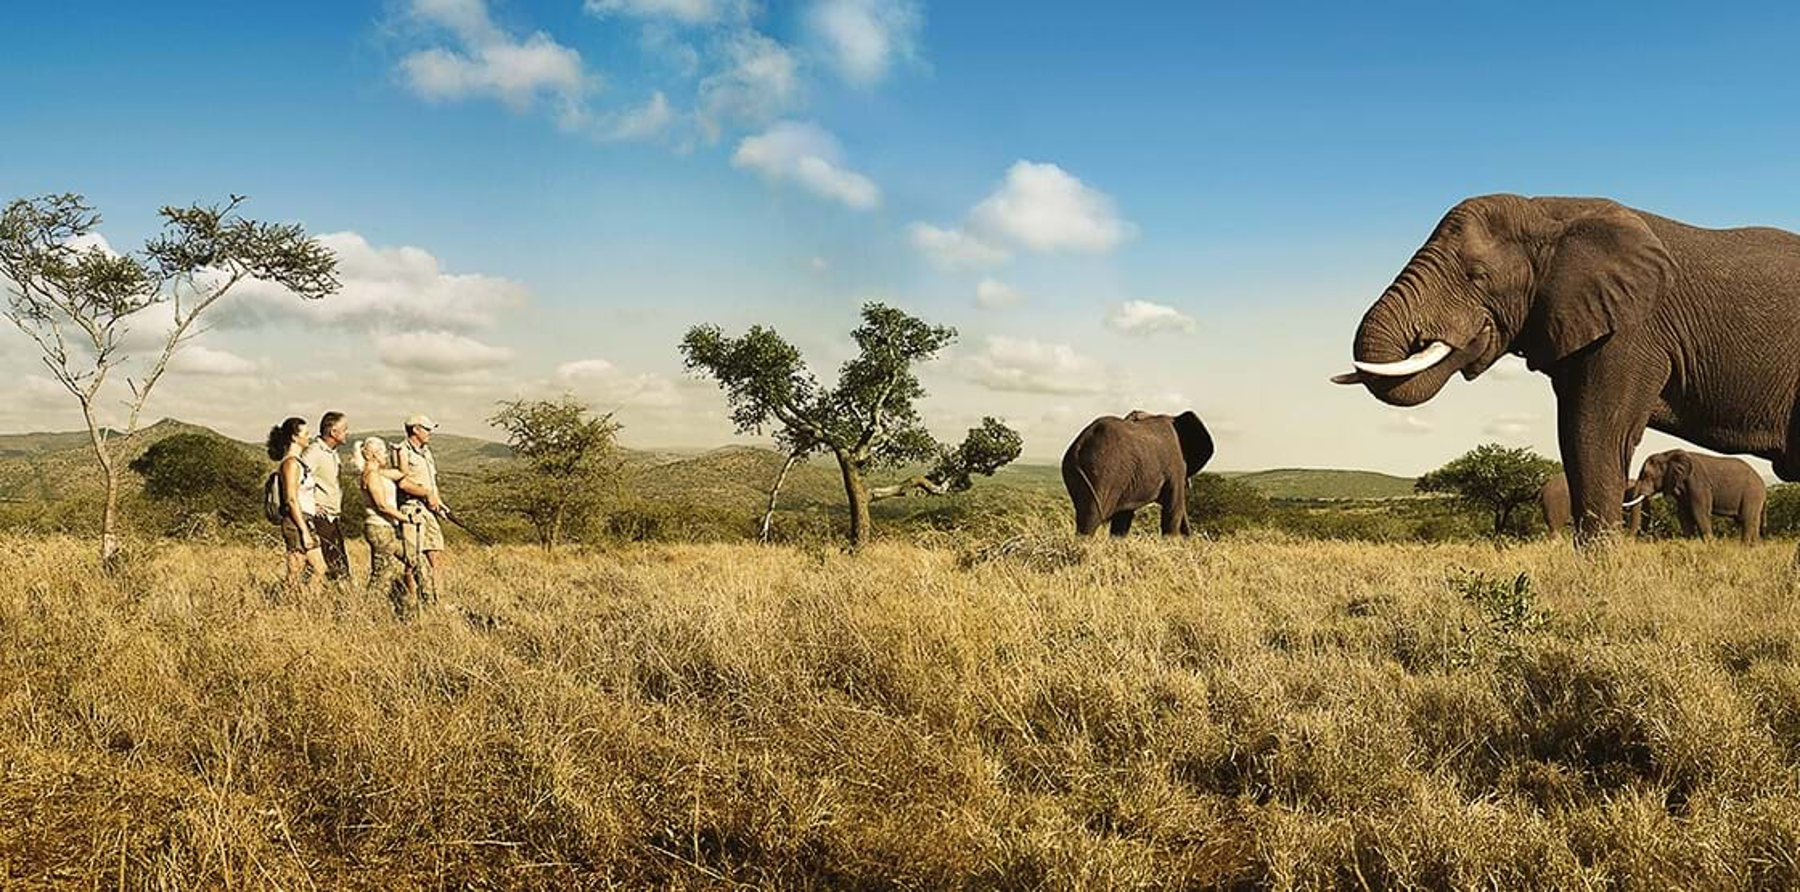 Walking safari holidays in South Africa